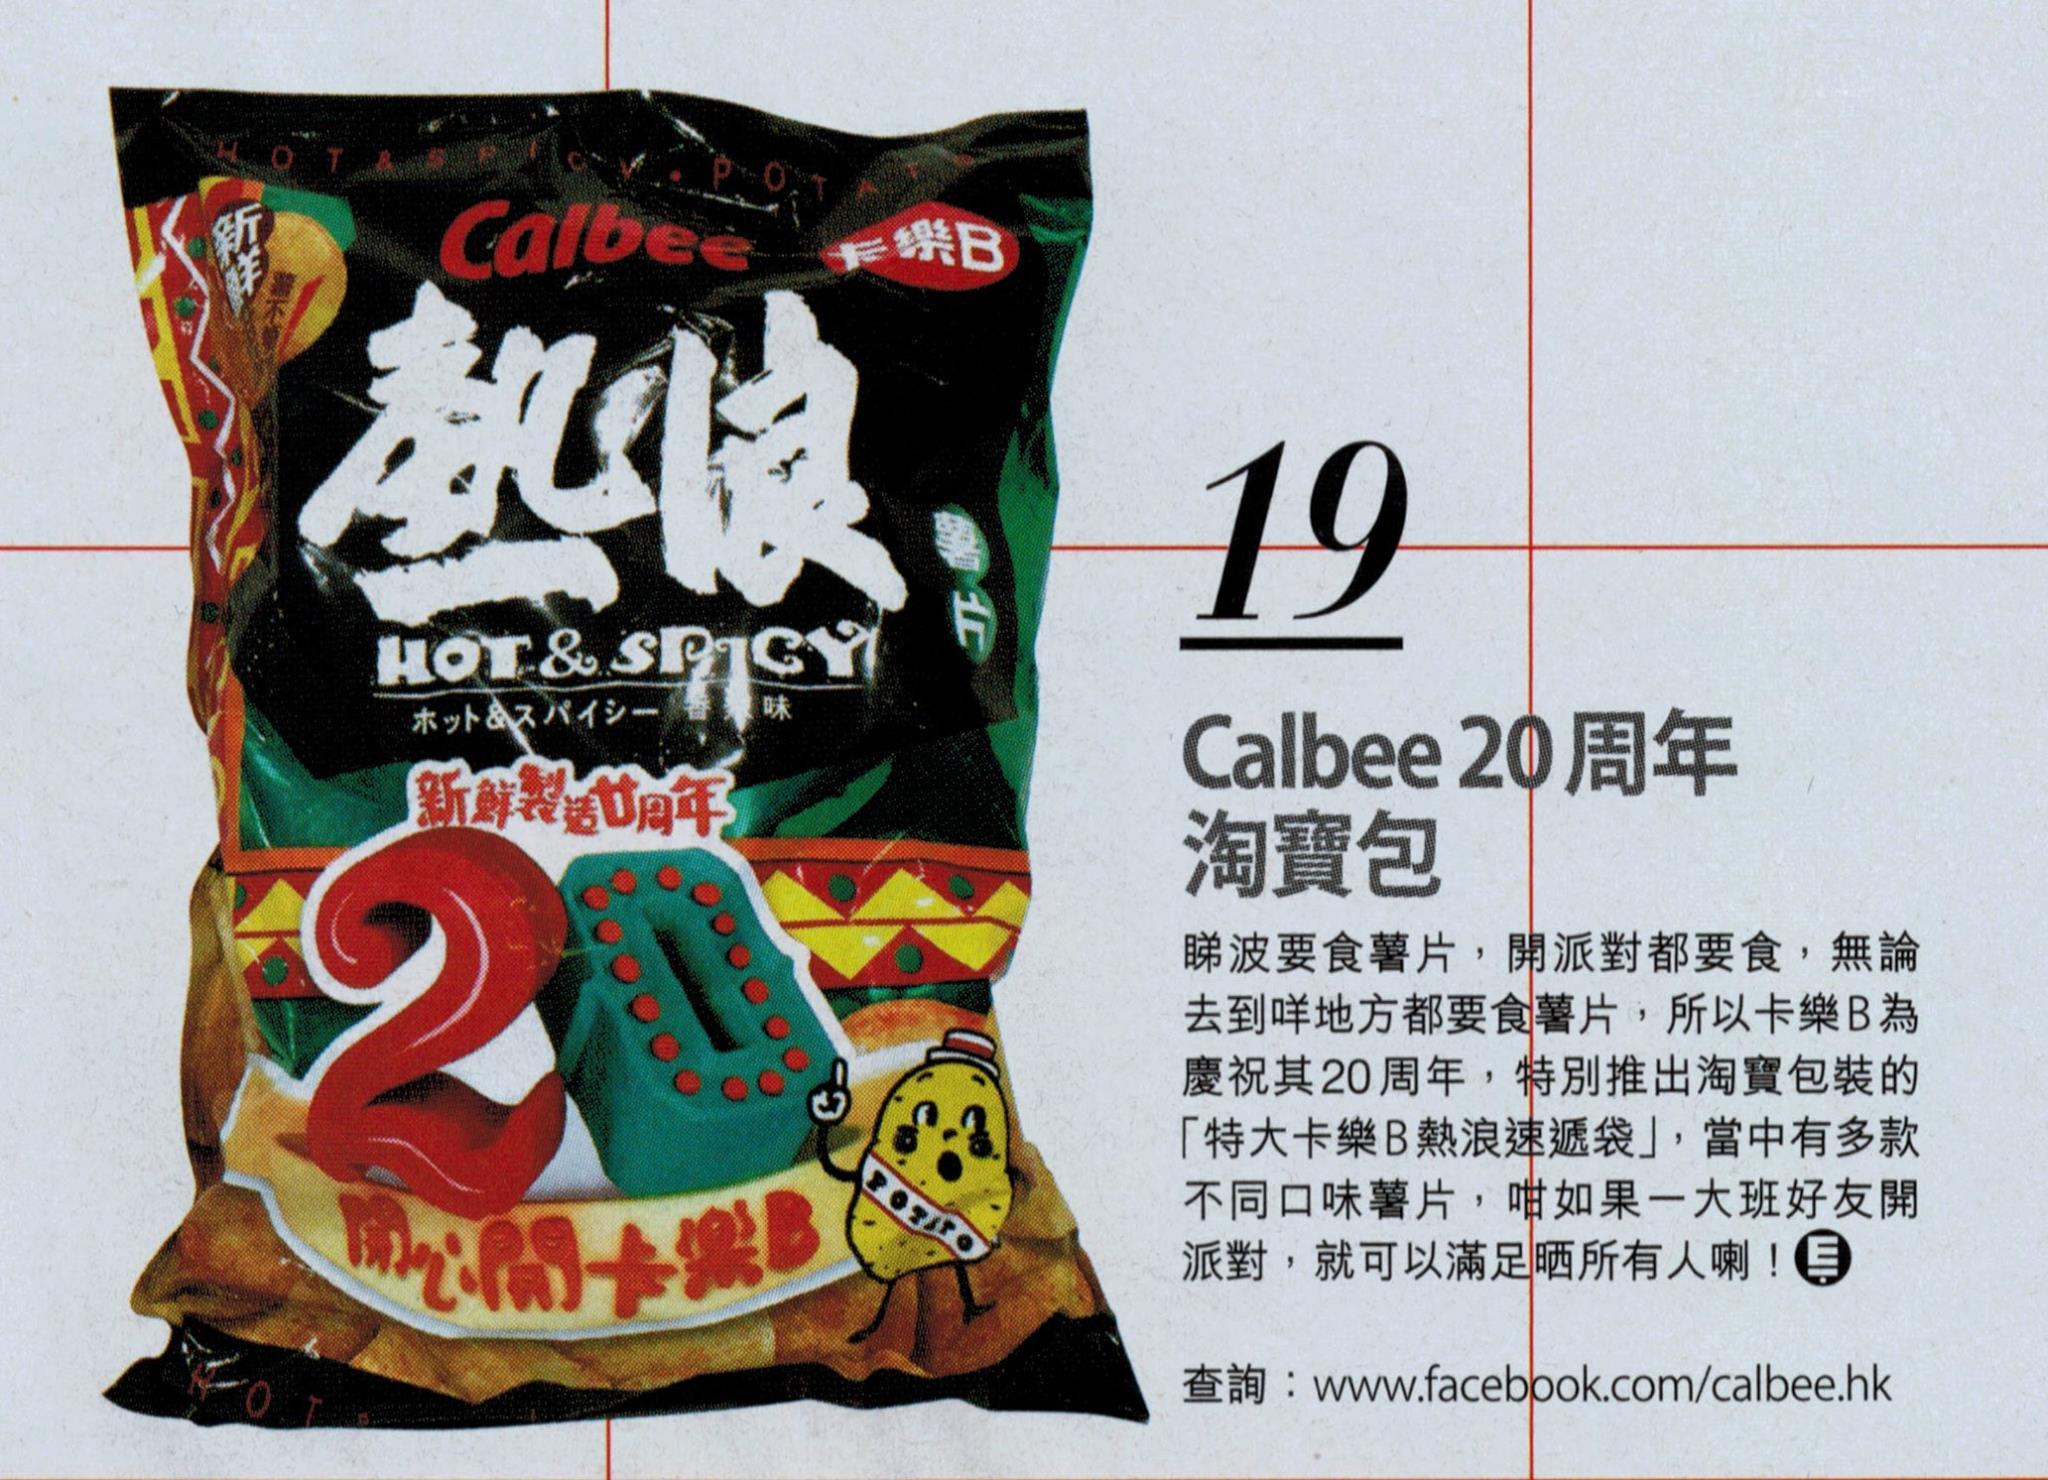 Calbee 17